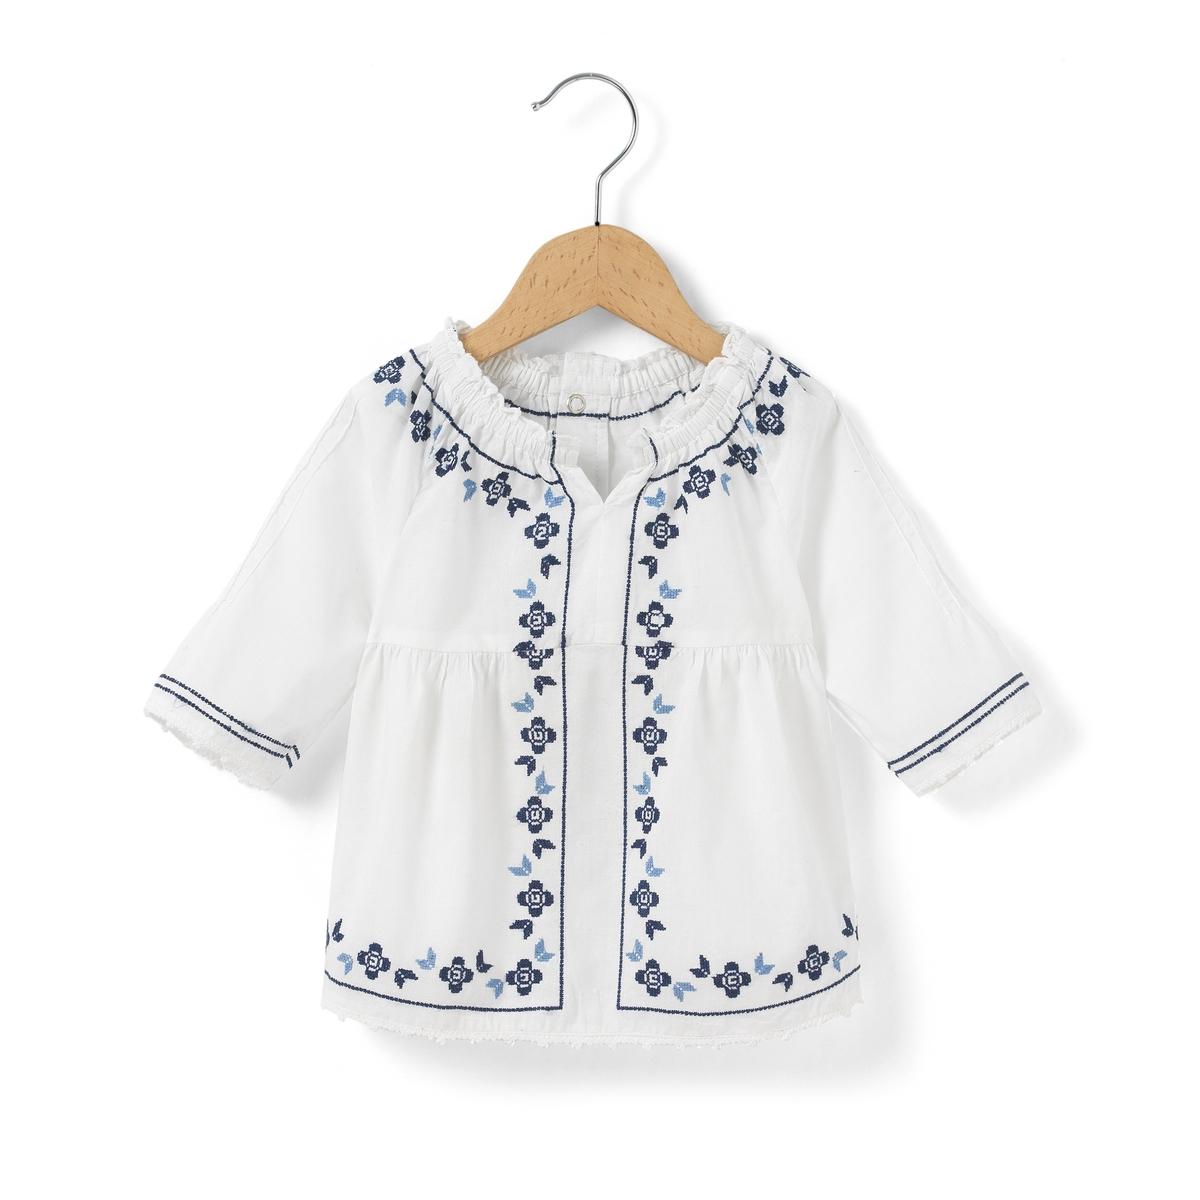 Блузка с вышивкой 1 мес-3 лет